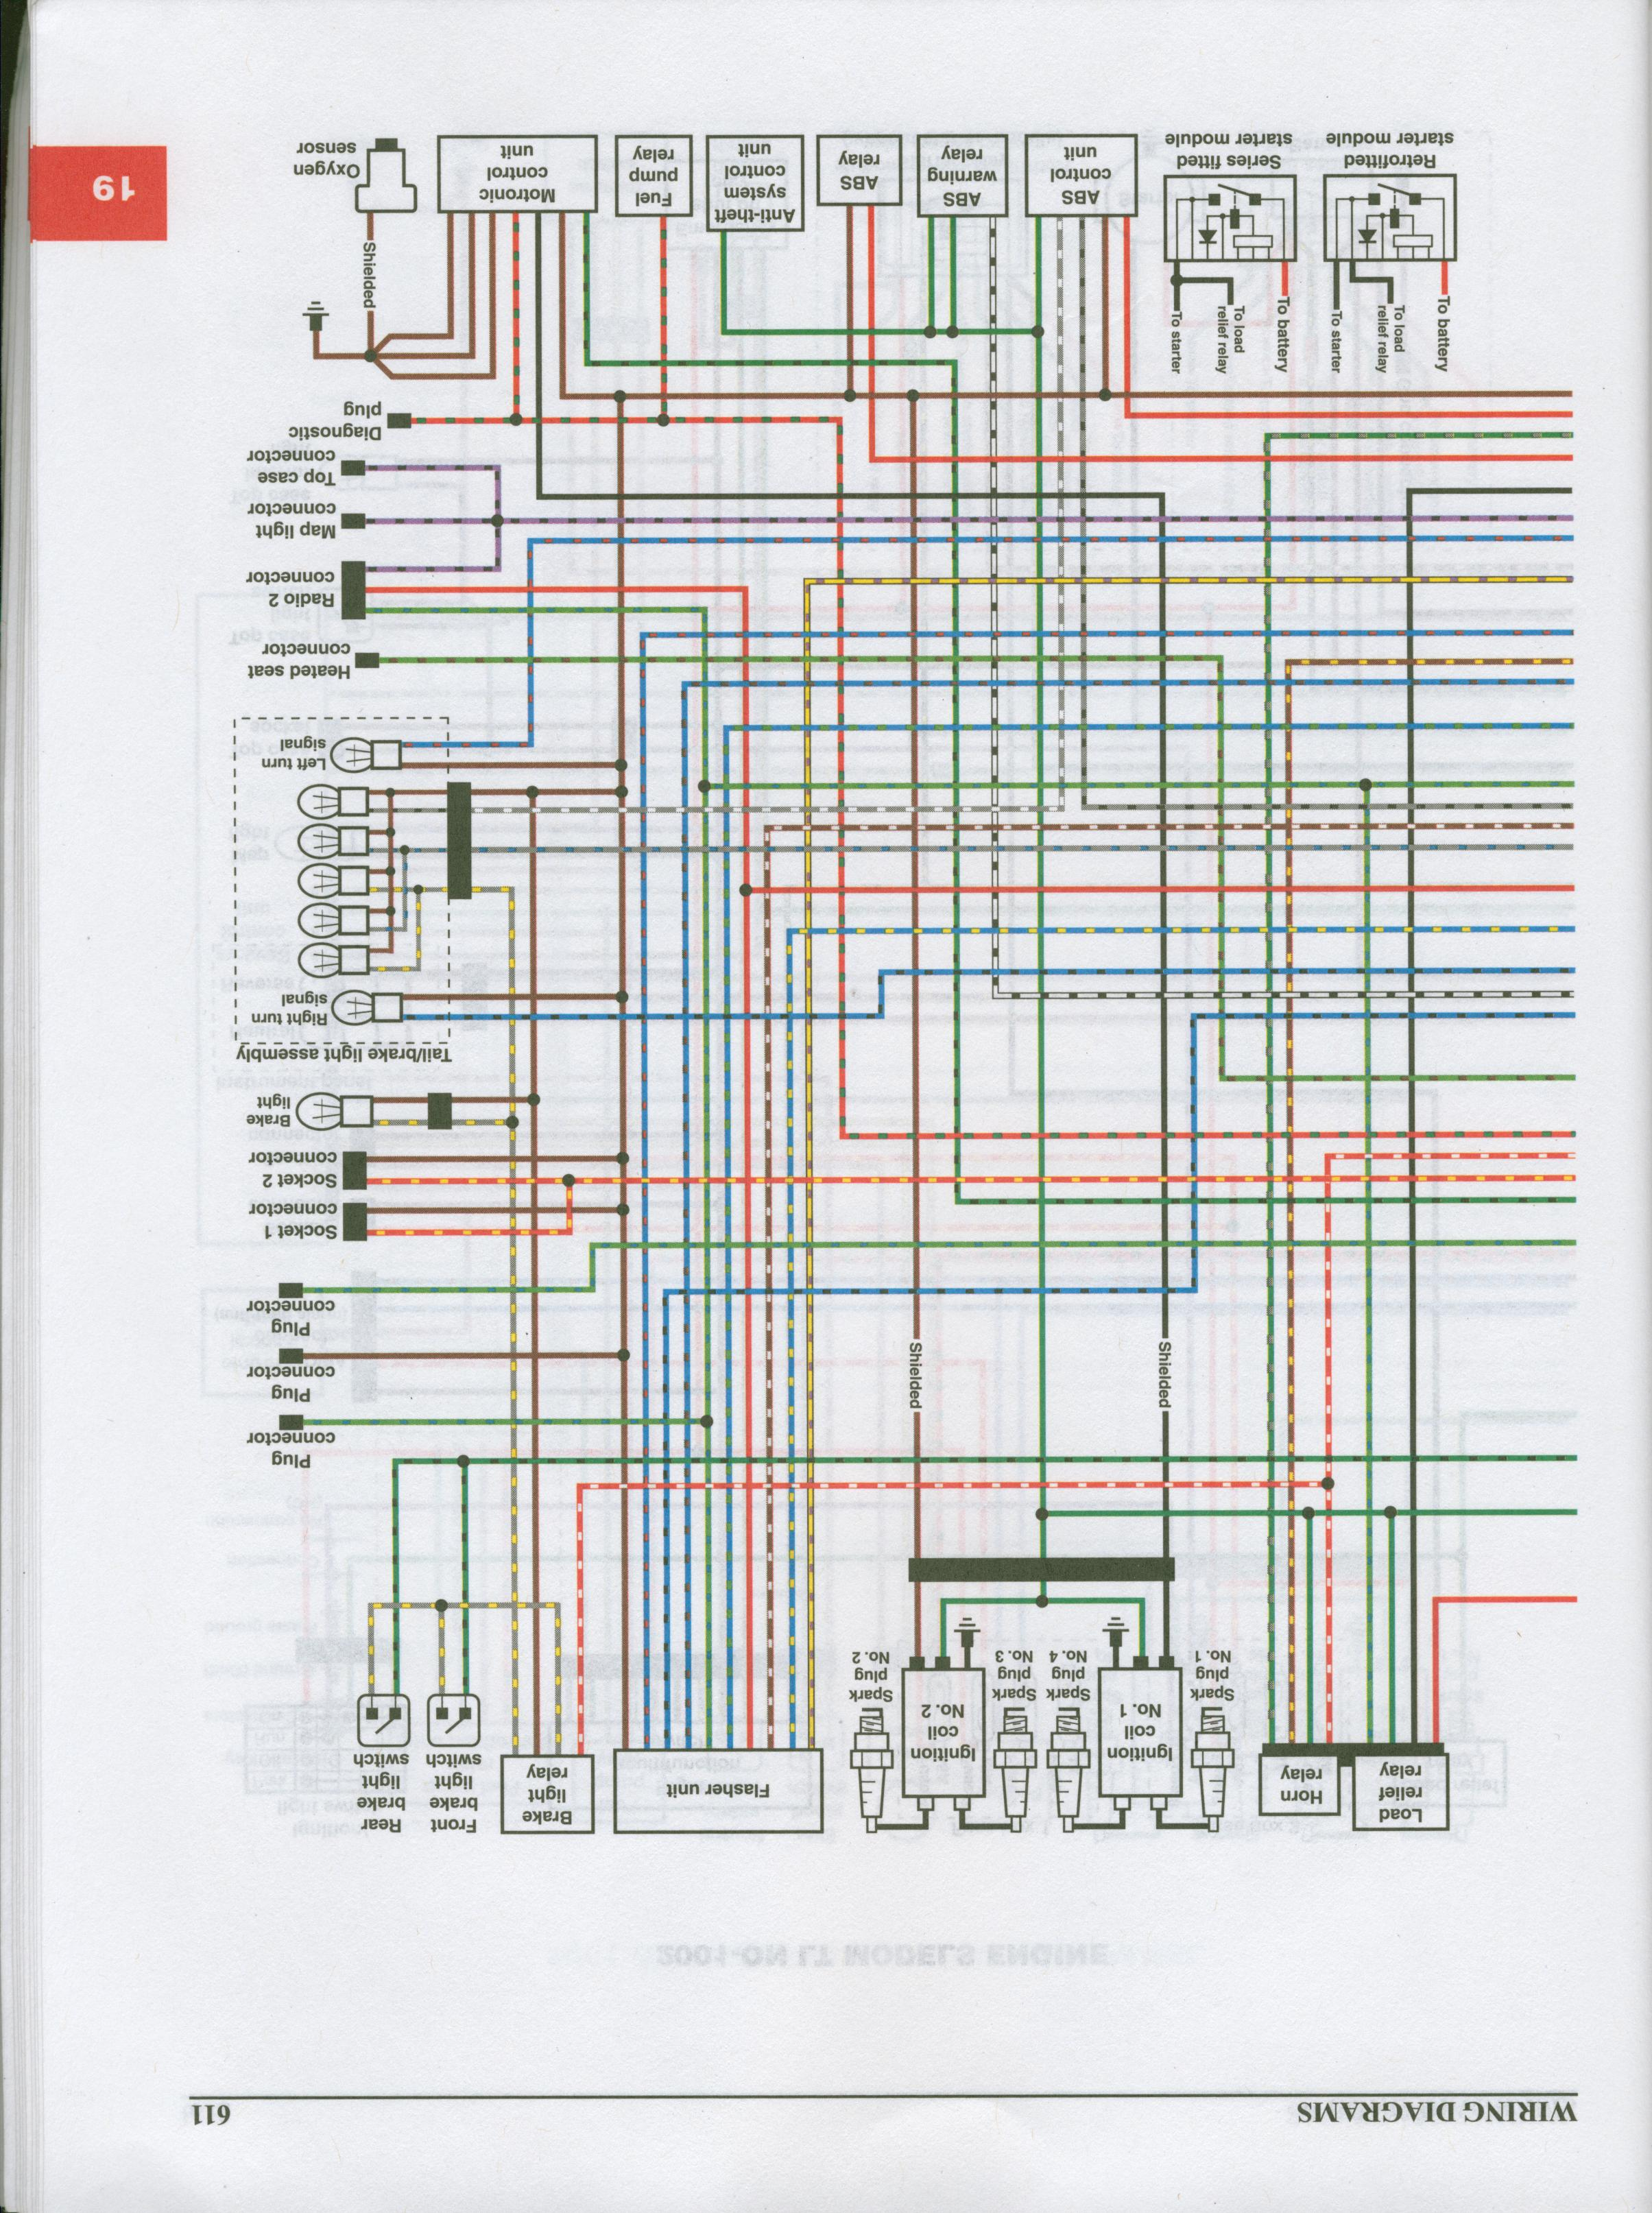 Wiring diagram -2002 Lt needed. | BMW Luxury Touring Community | Bmw K1200rs Wiring Diagram |  | BMW Luxury Touring Community